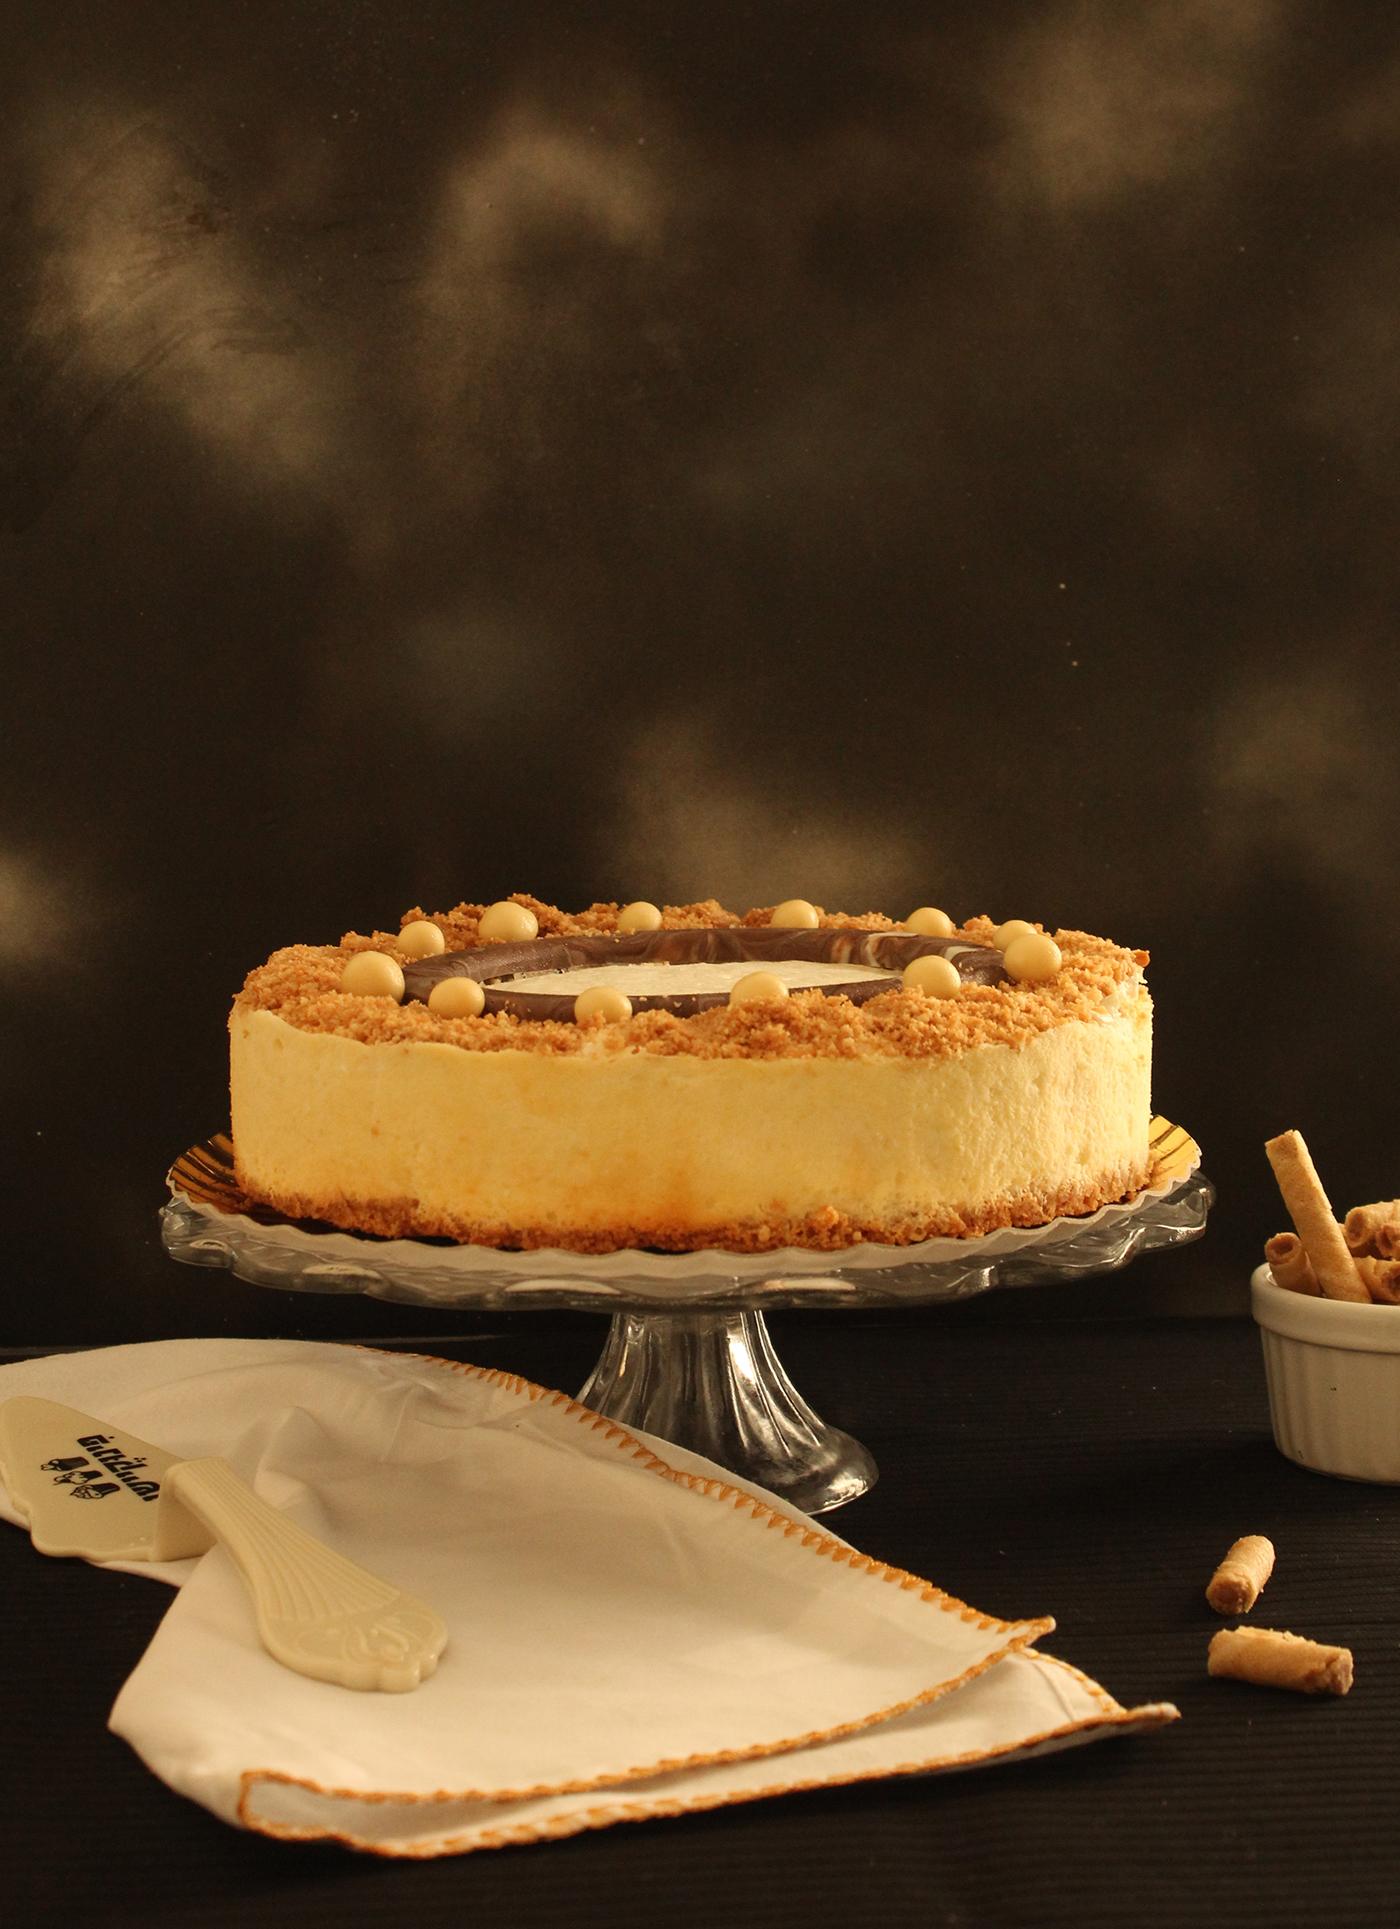 IMG 8279 - עוגת גבינה גבוהה וטעימה